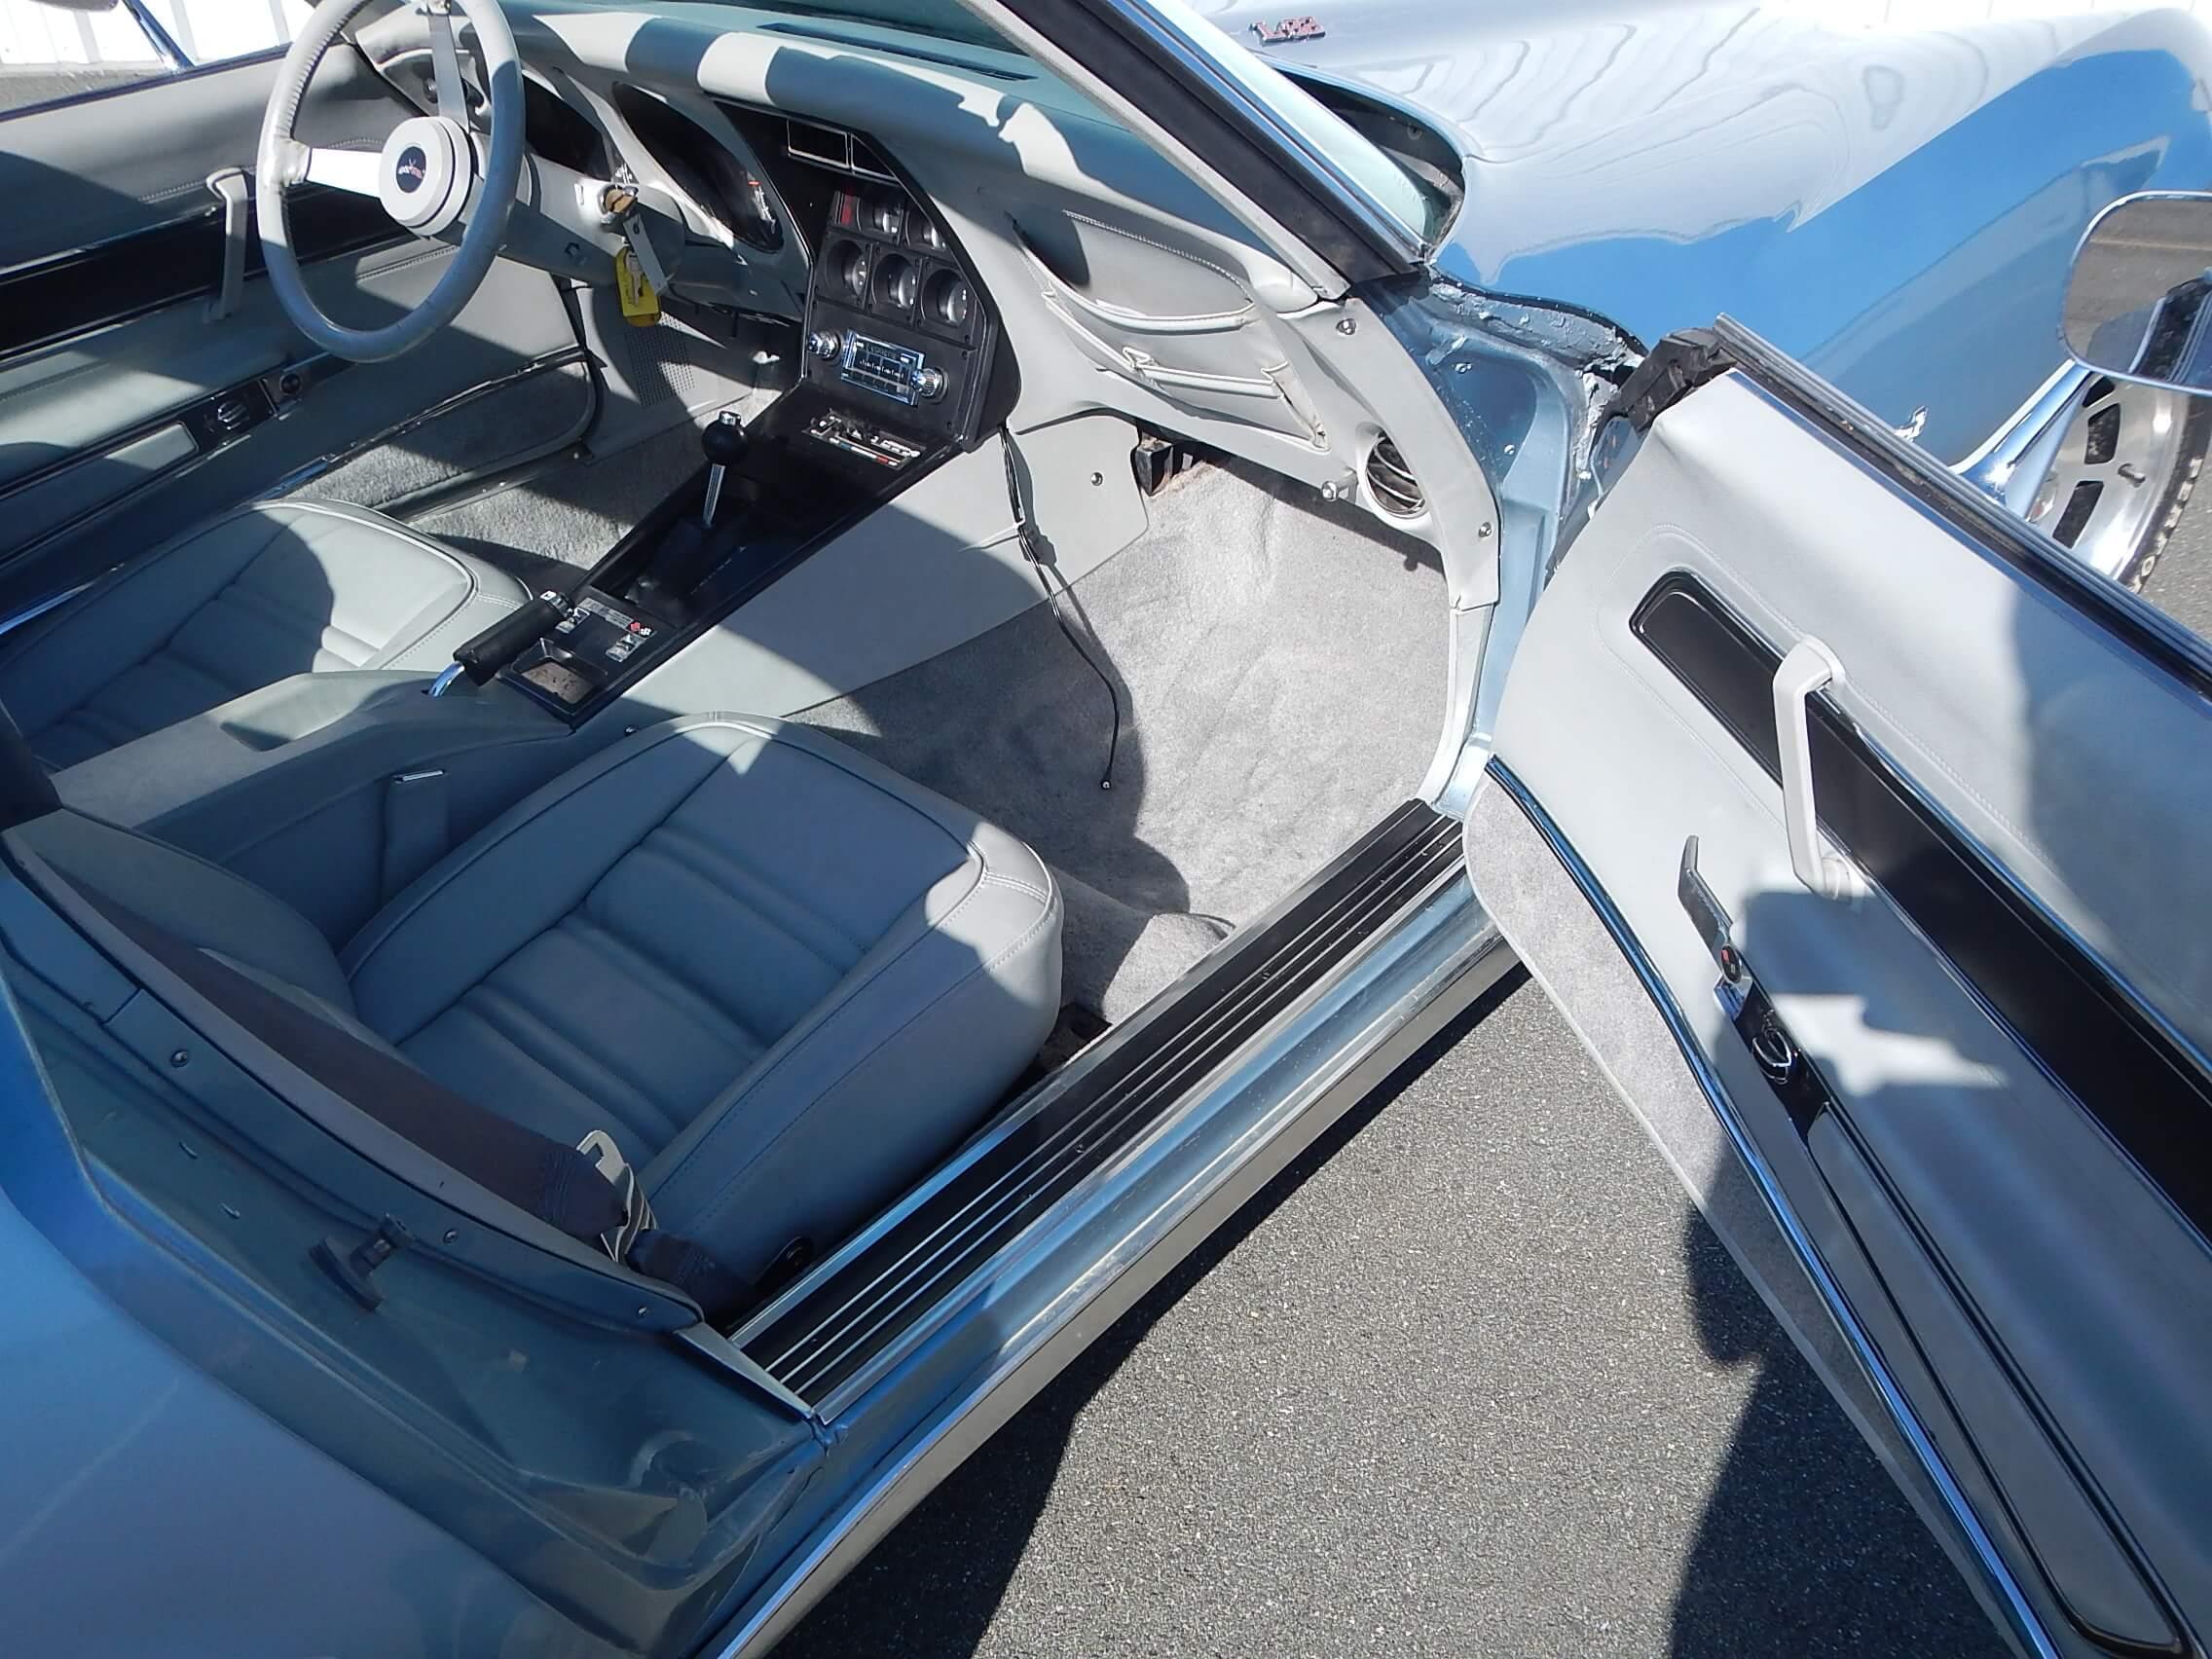 1977 Corvette Coupe restoration 59.JPG